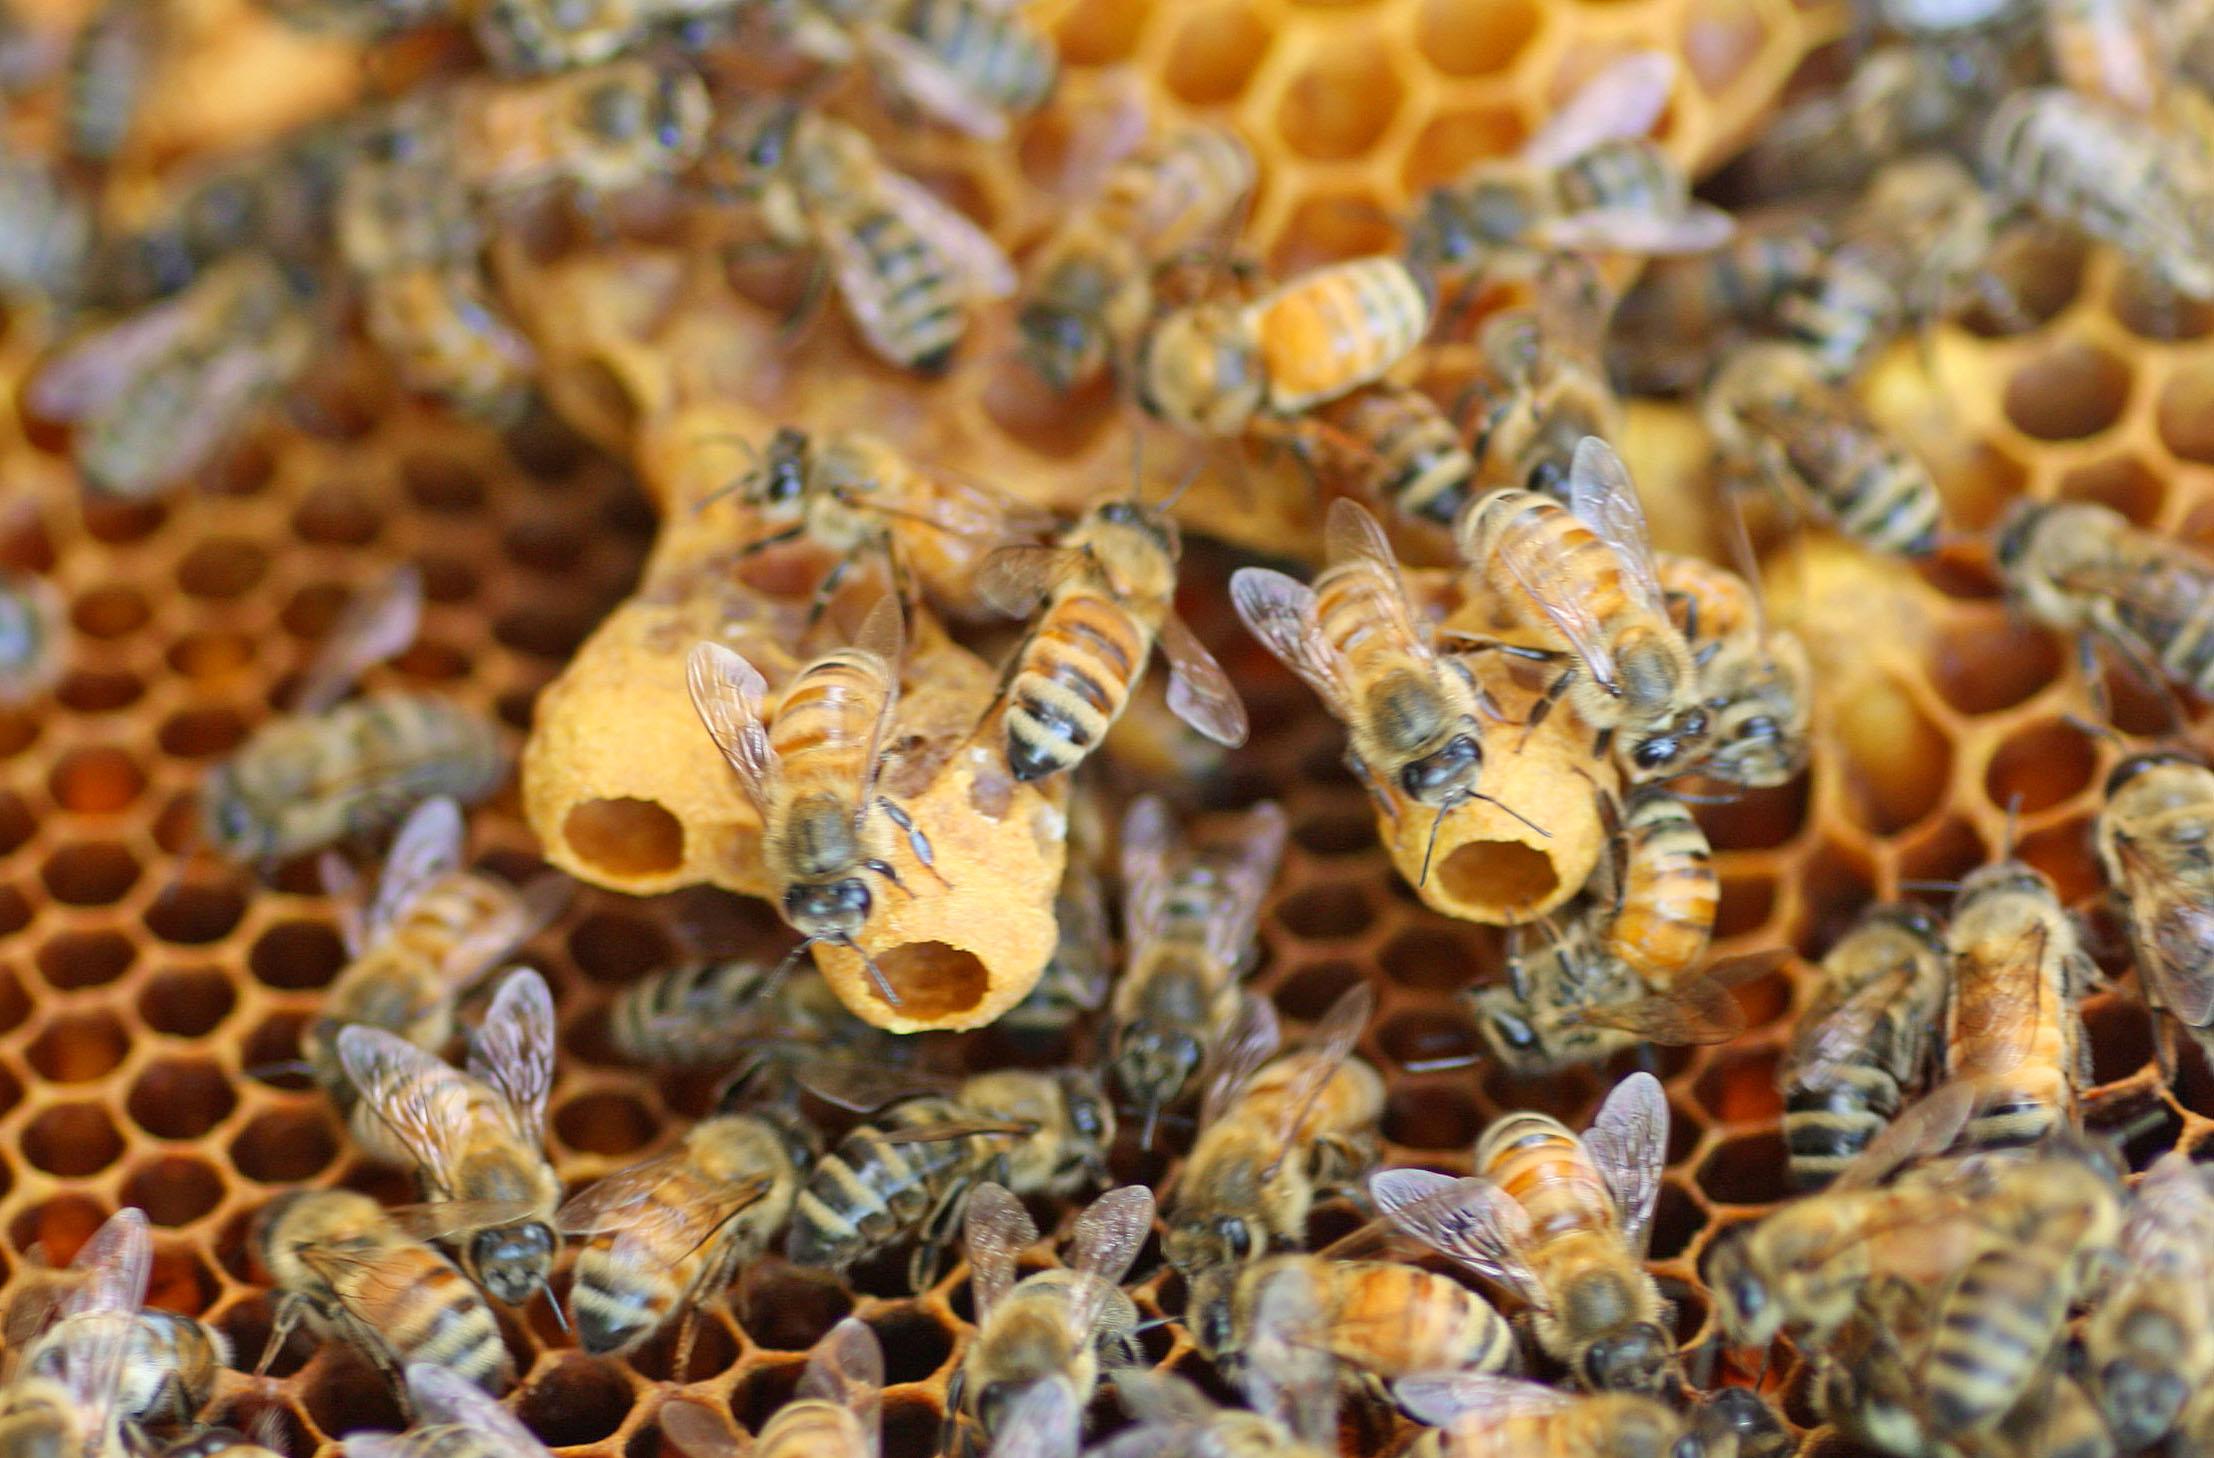 https://i0.wp.com/honeybeesuite.com/wp-content/uploads/2011/06/Swarm-cells.jpg